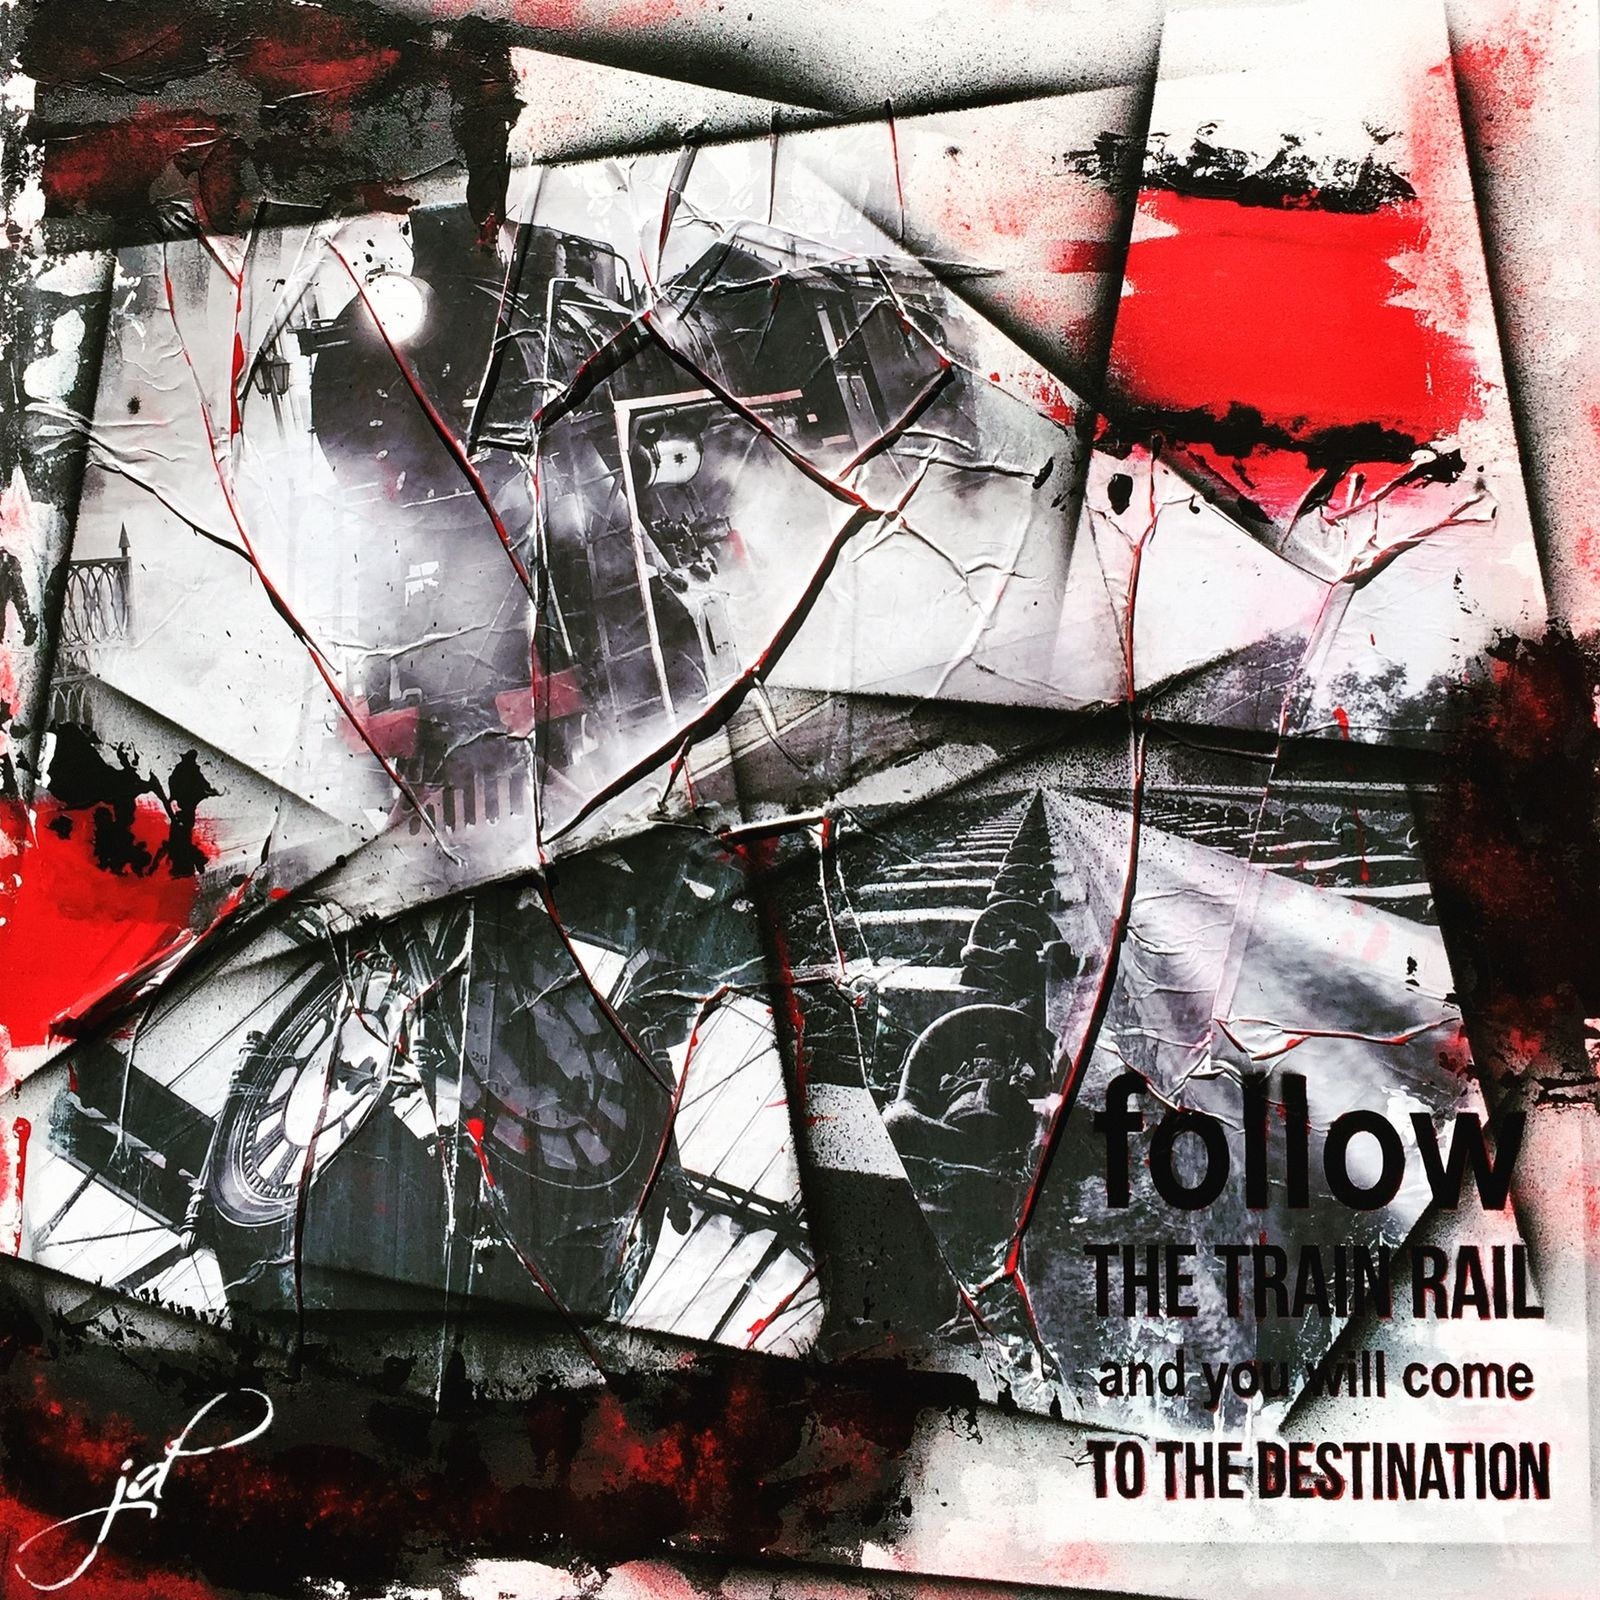 Train-Rail-Destination-red-black